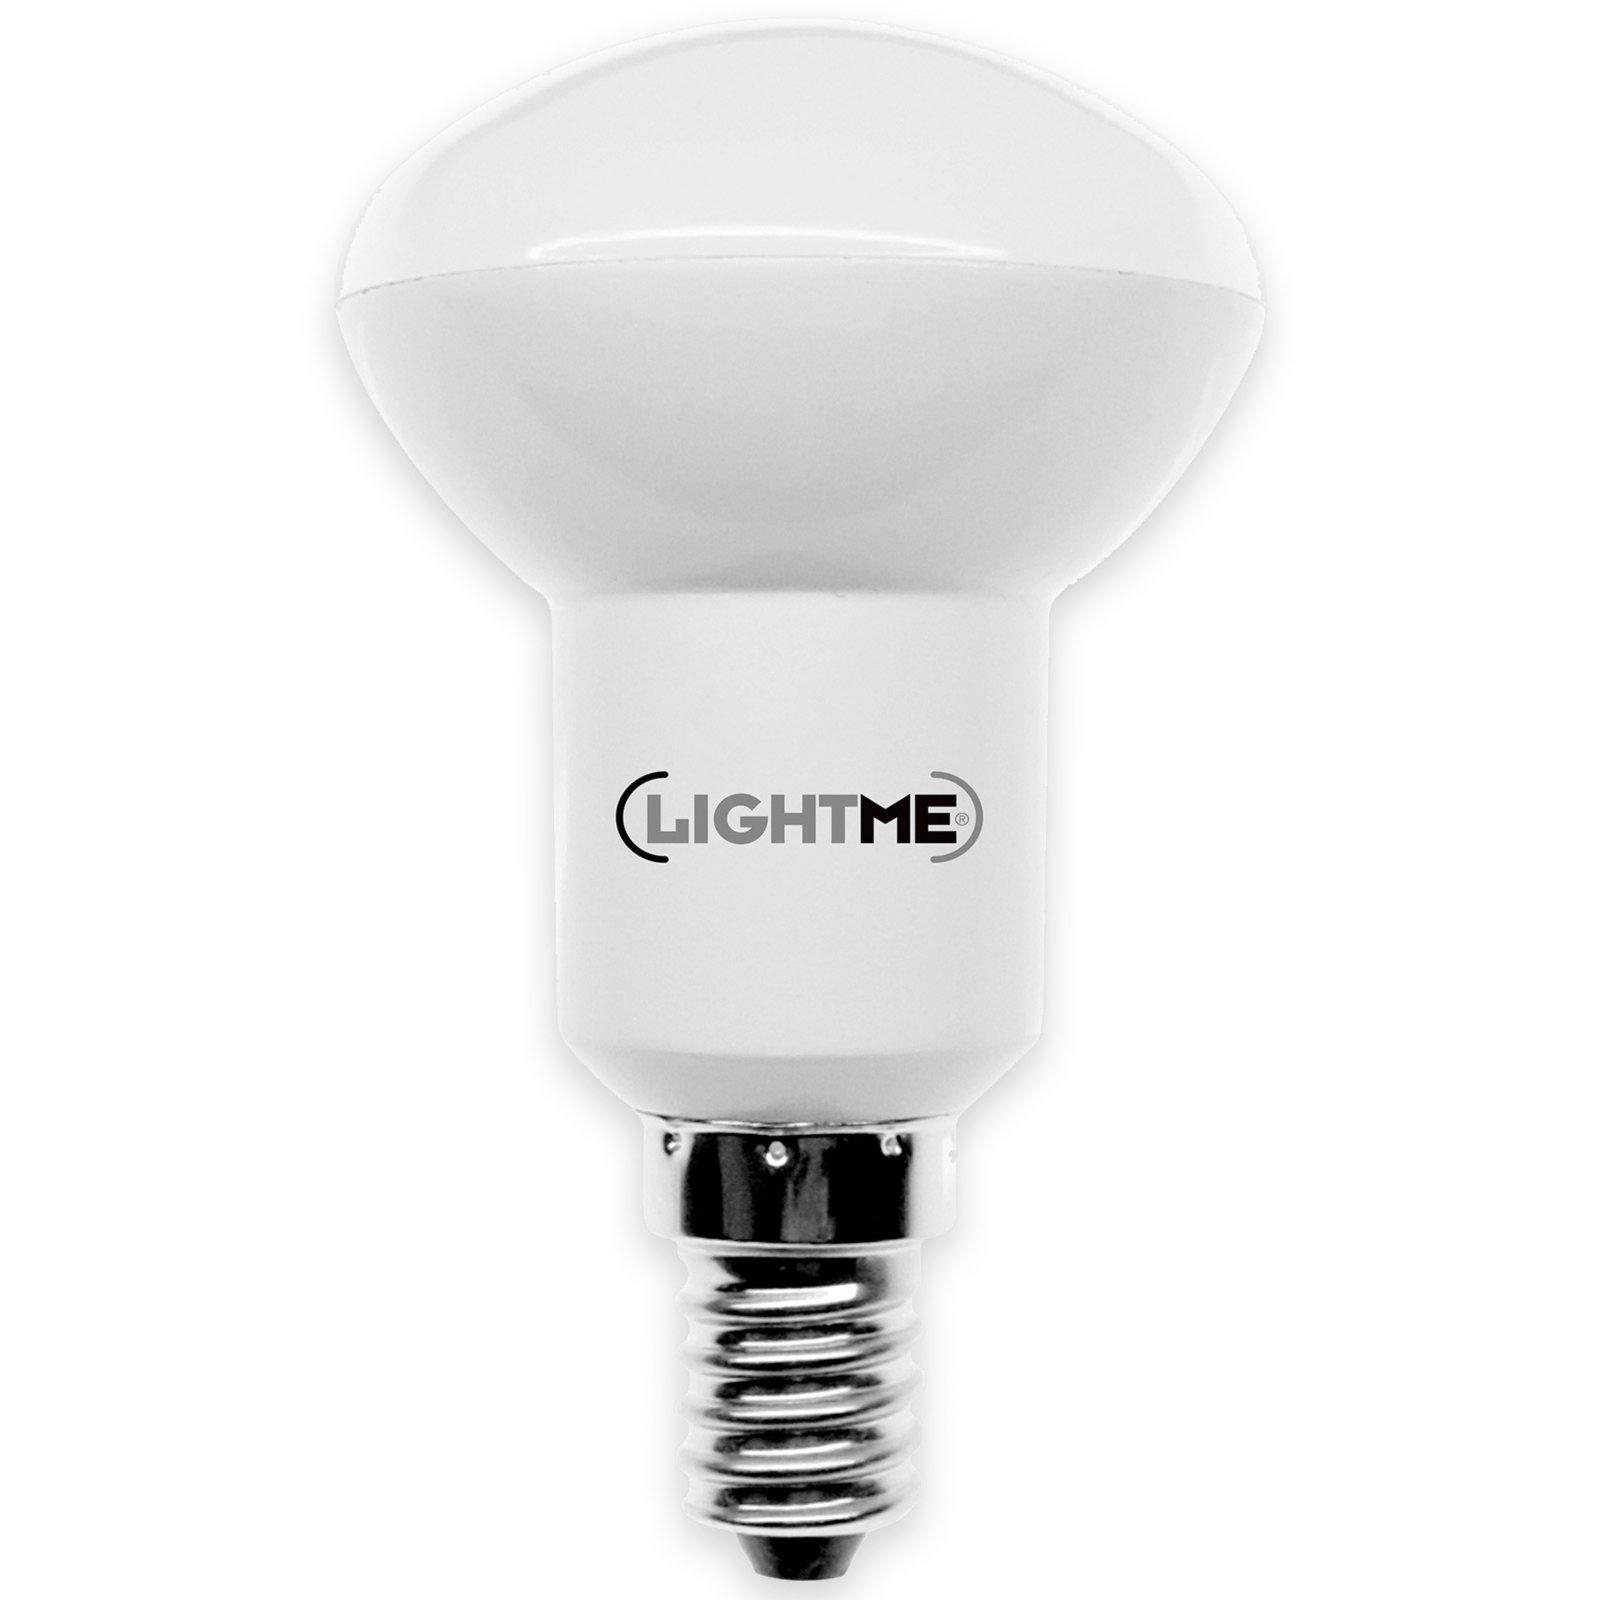 LED-Reflektor LIGHTME - E 14 - 6 Watt - warmweiß